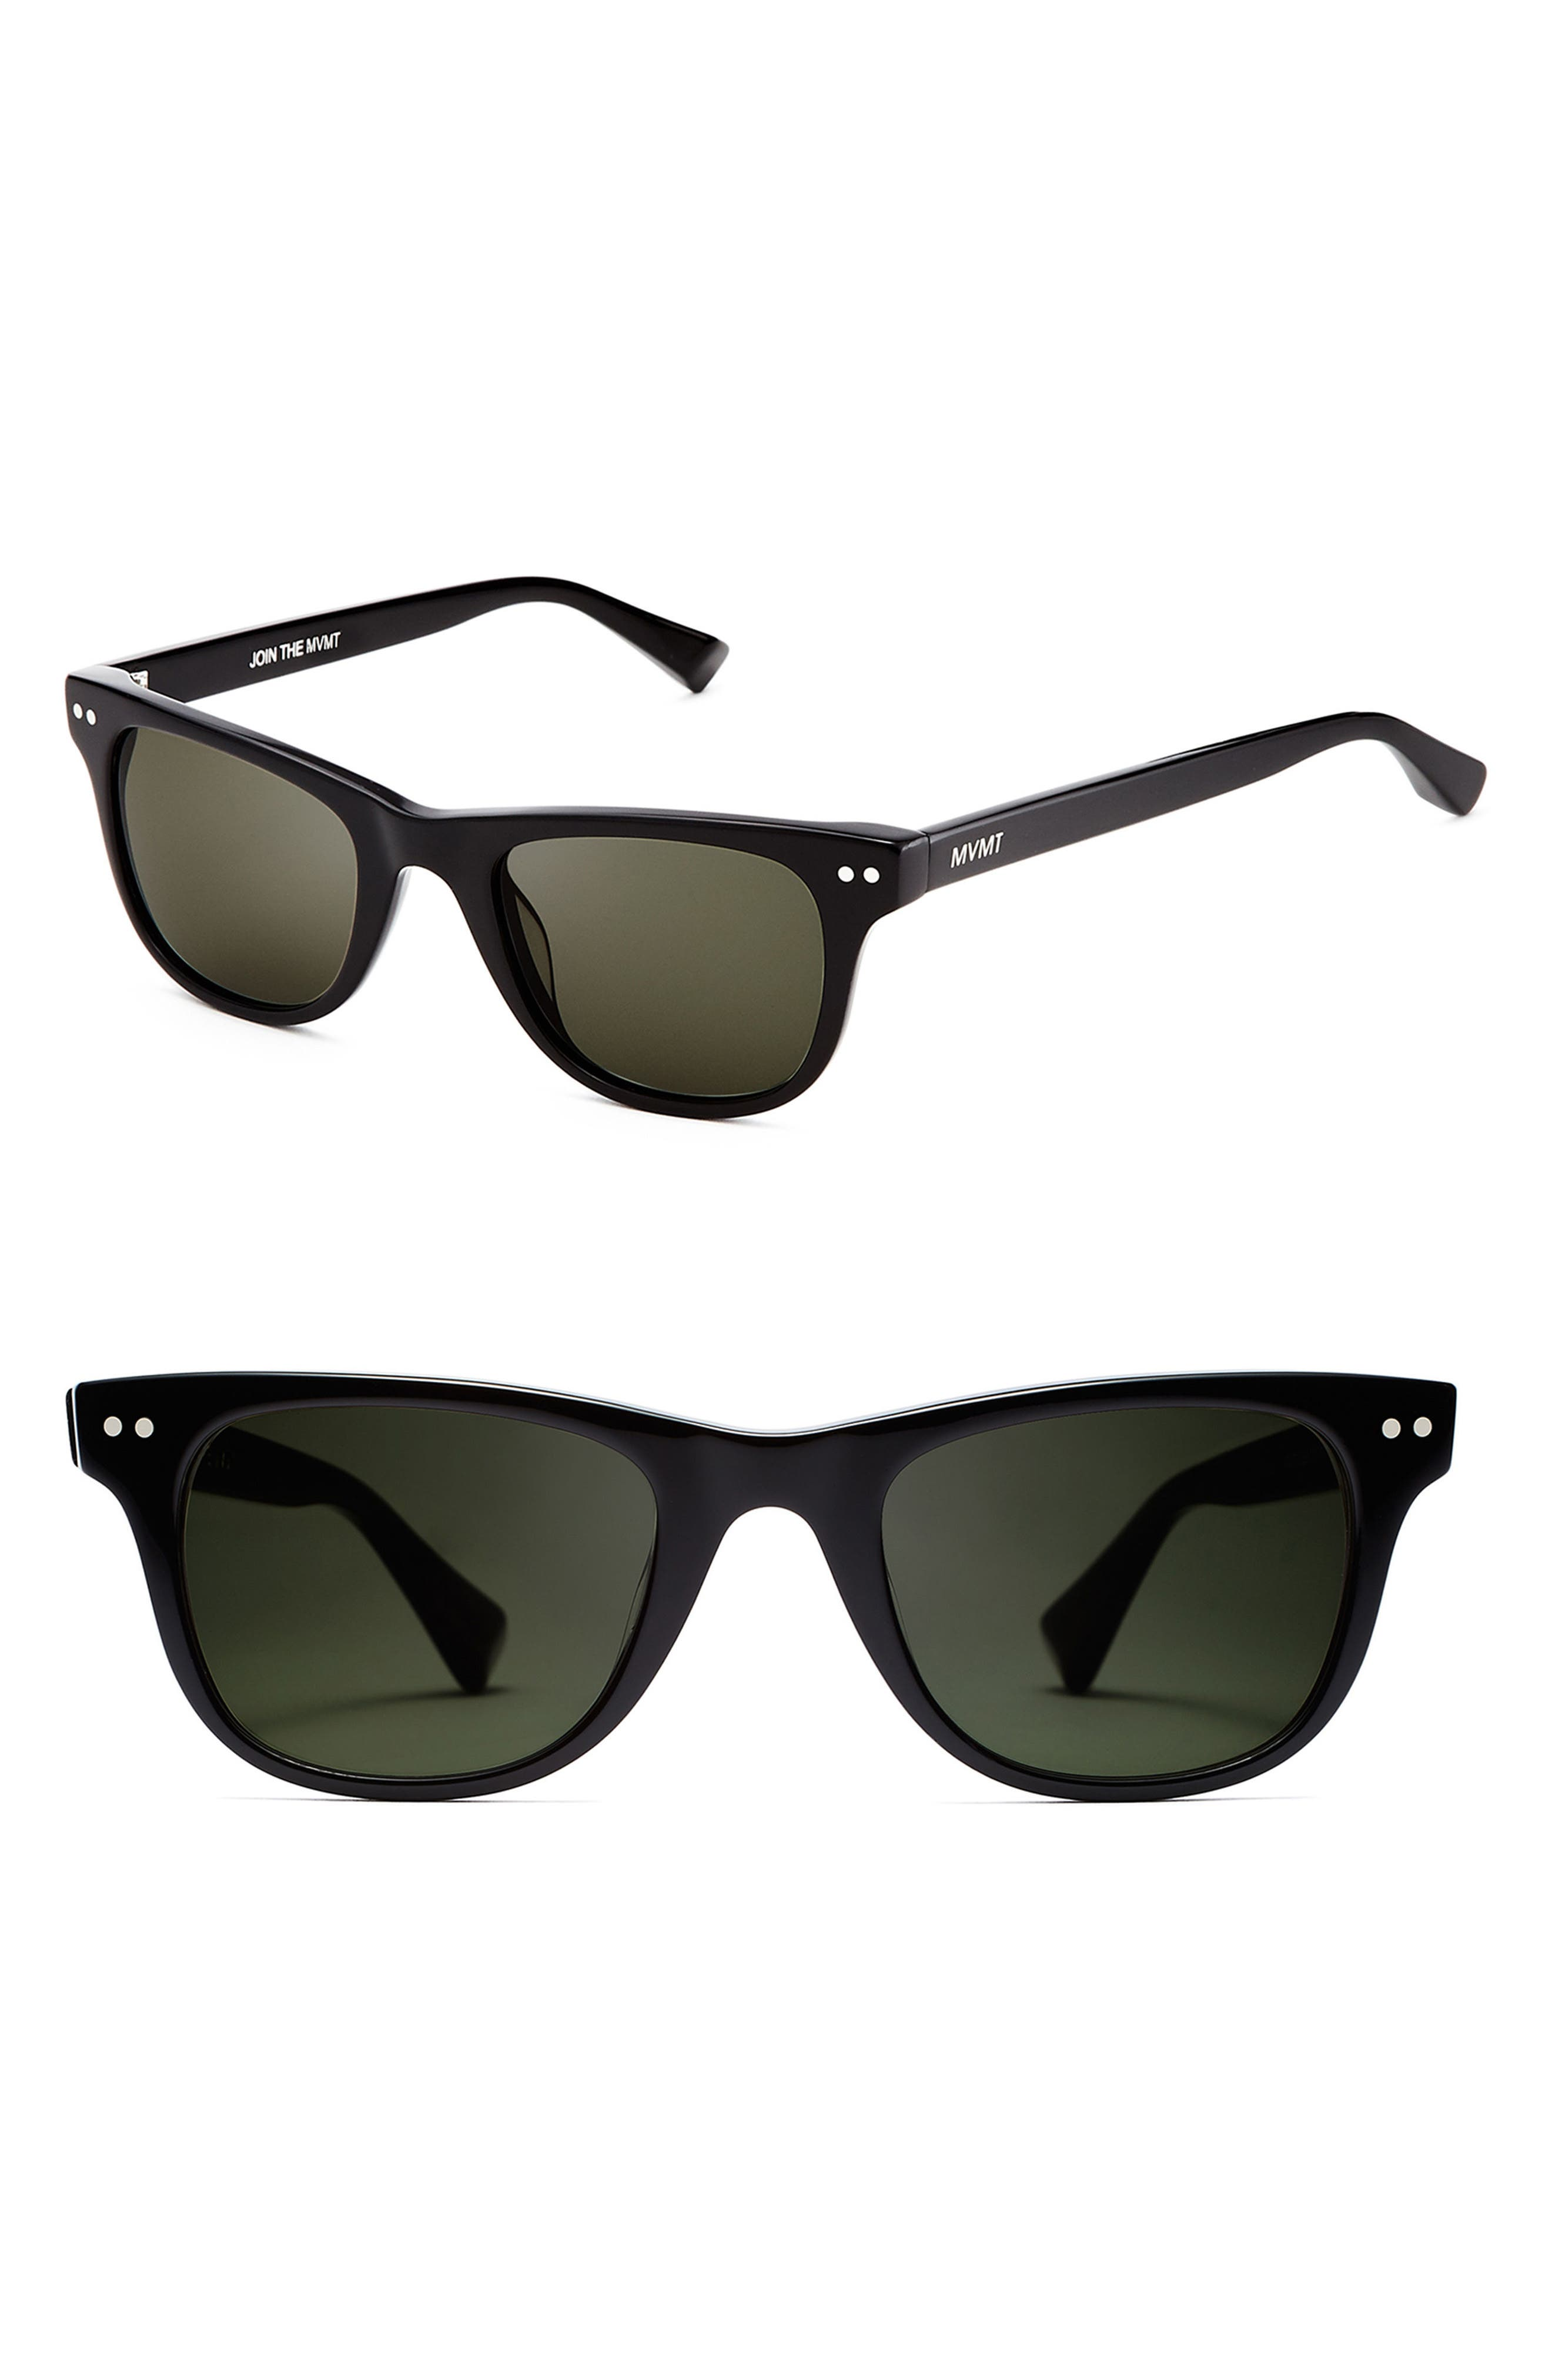 Outsider 51mm Sunglasses,                             Main thumbnail 1, color,                             PURE BLACK